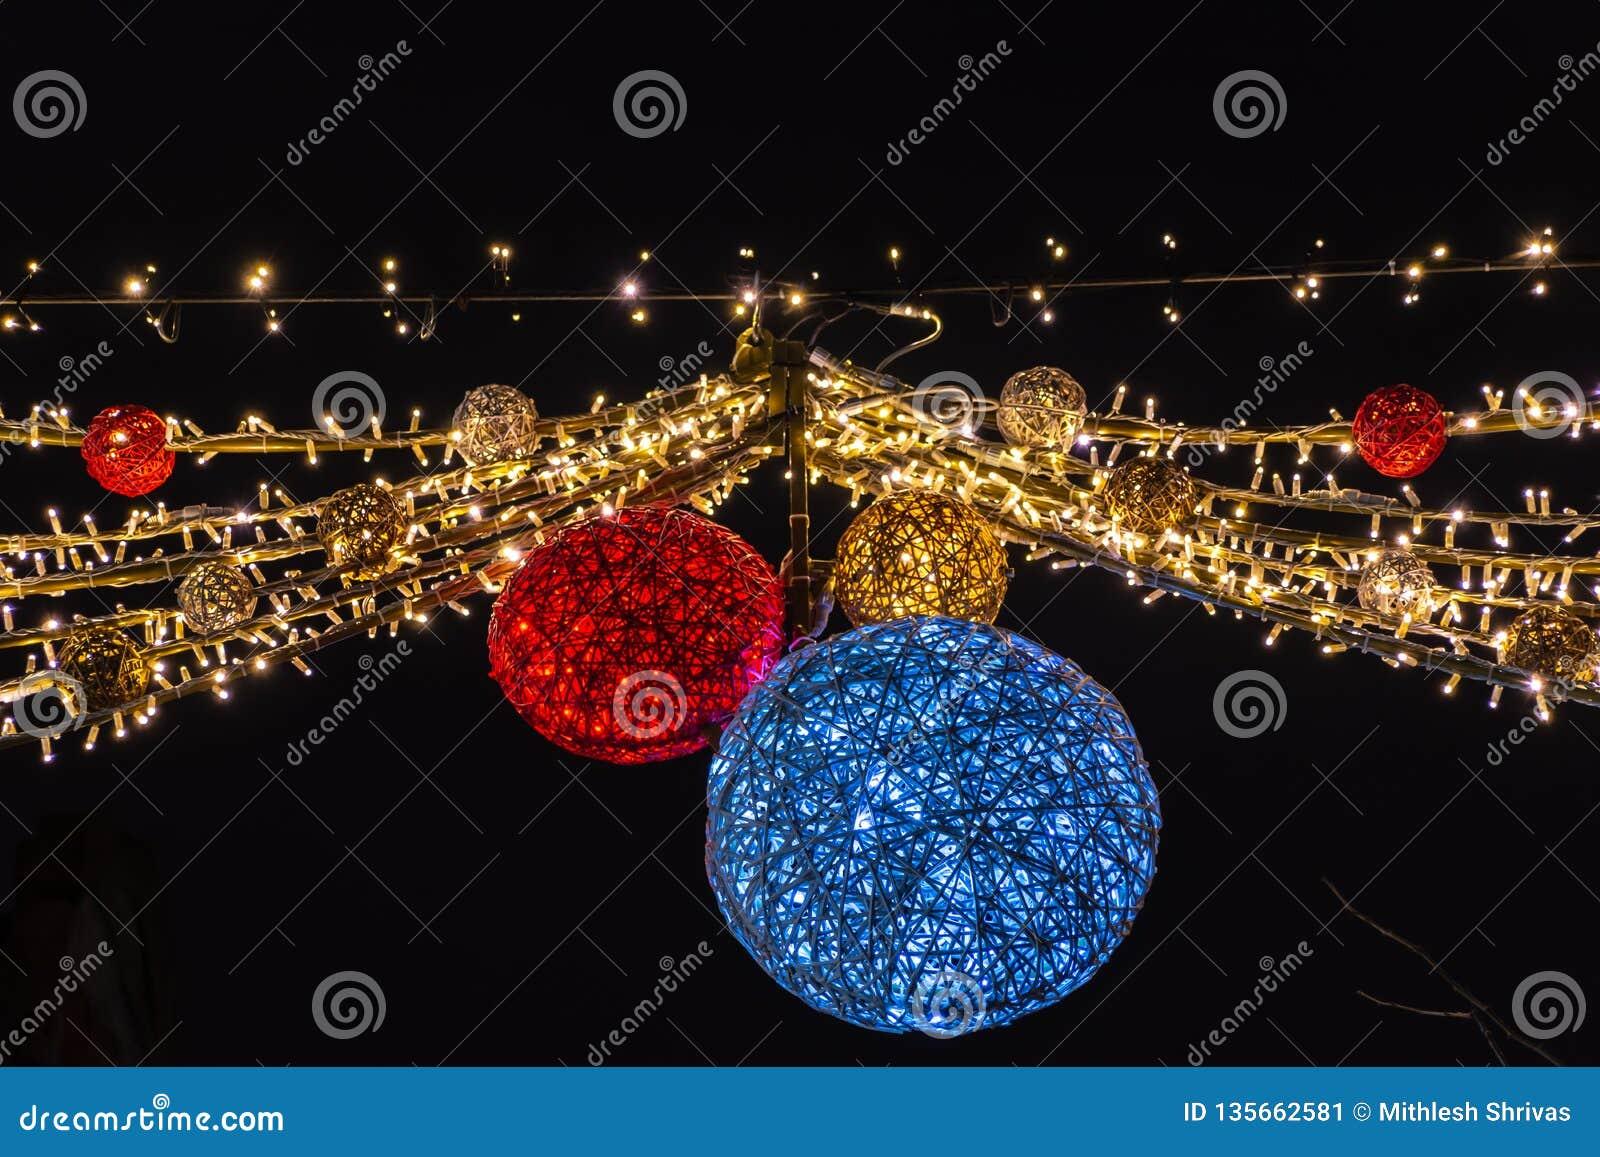 Beautiful Christmas lights hanging on the street, Leuven Belgium